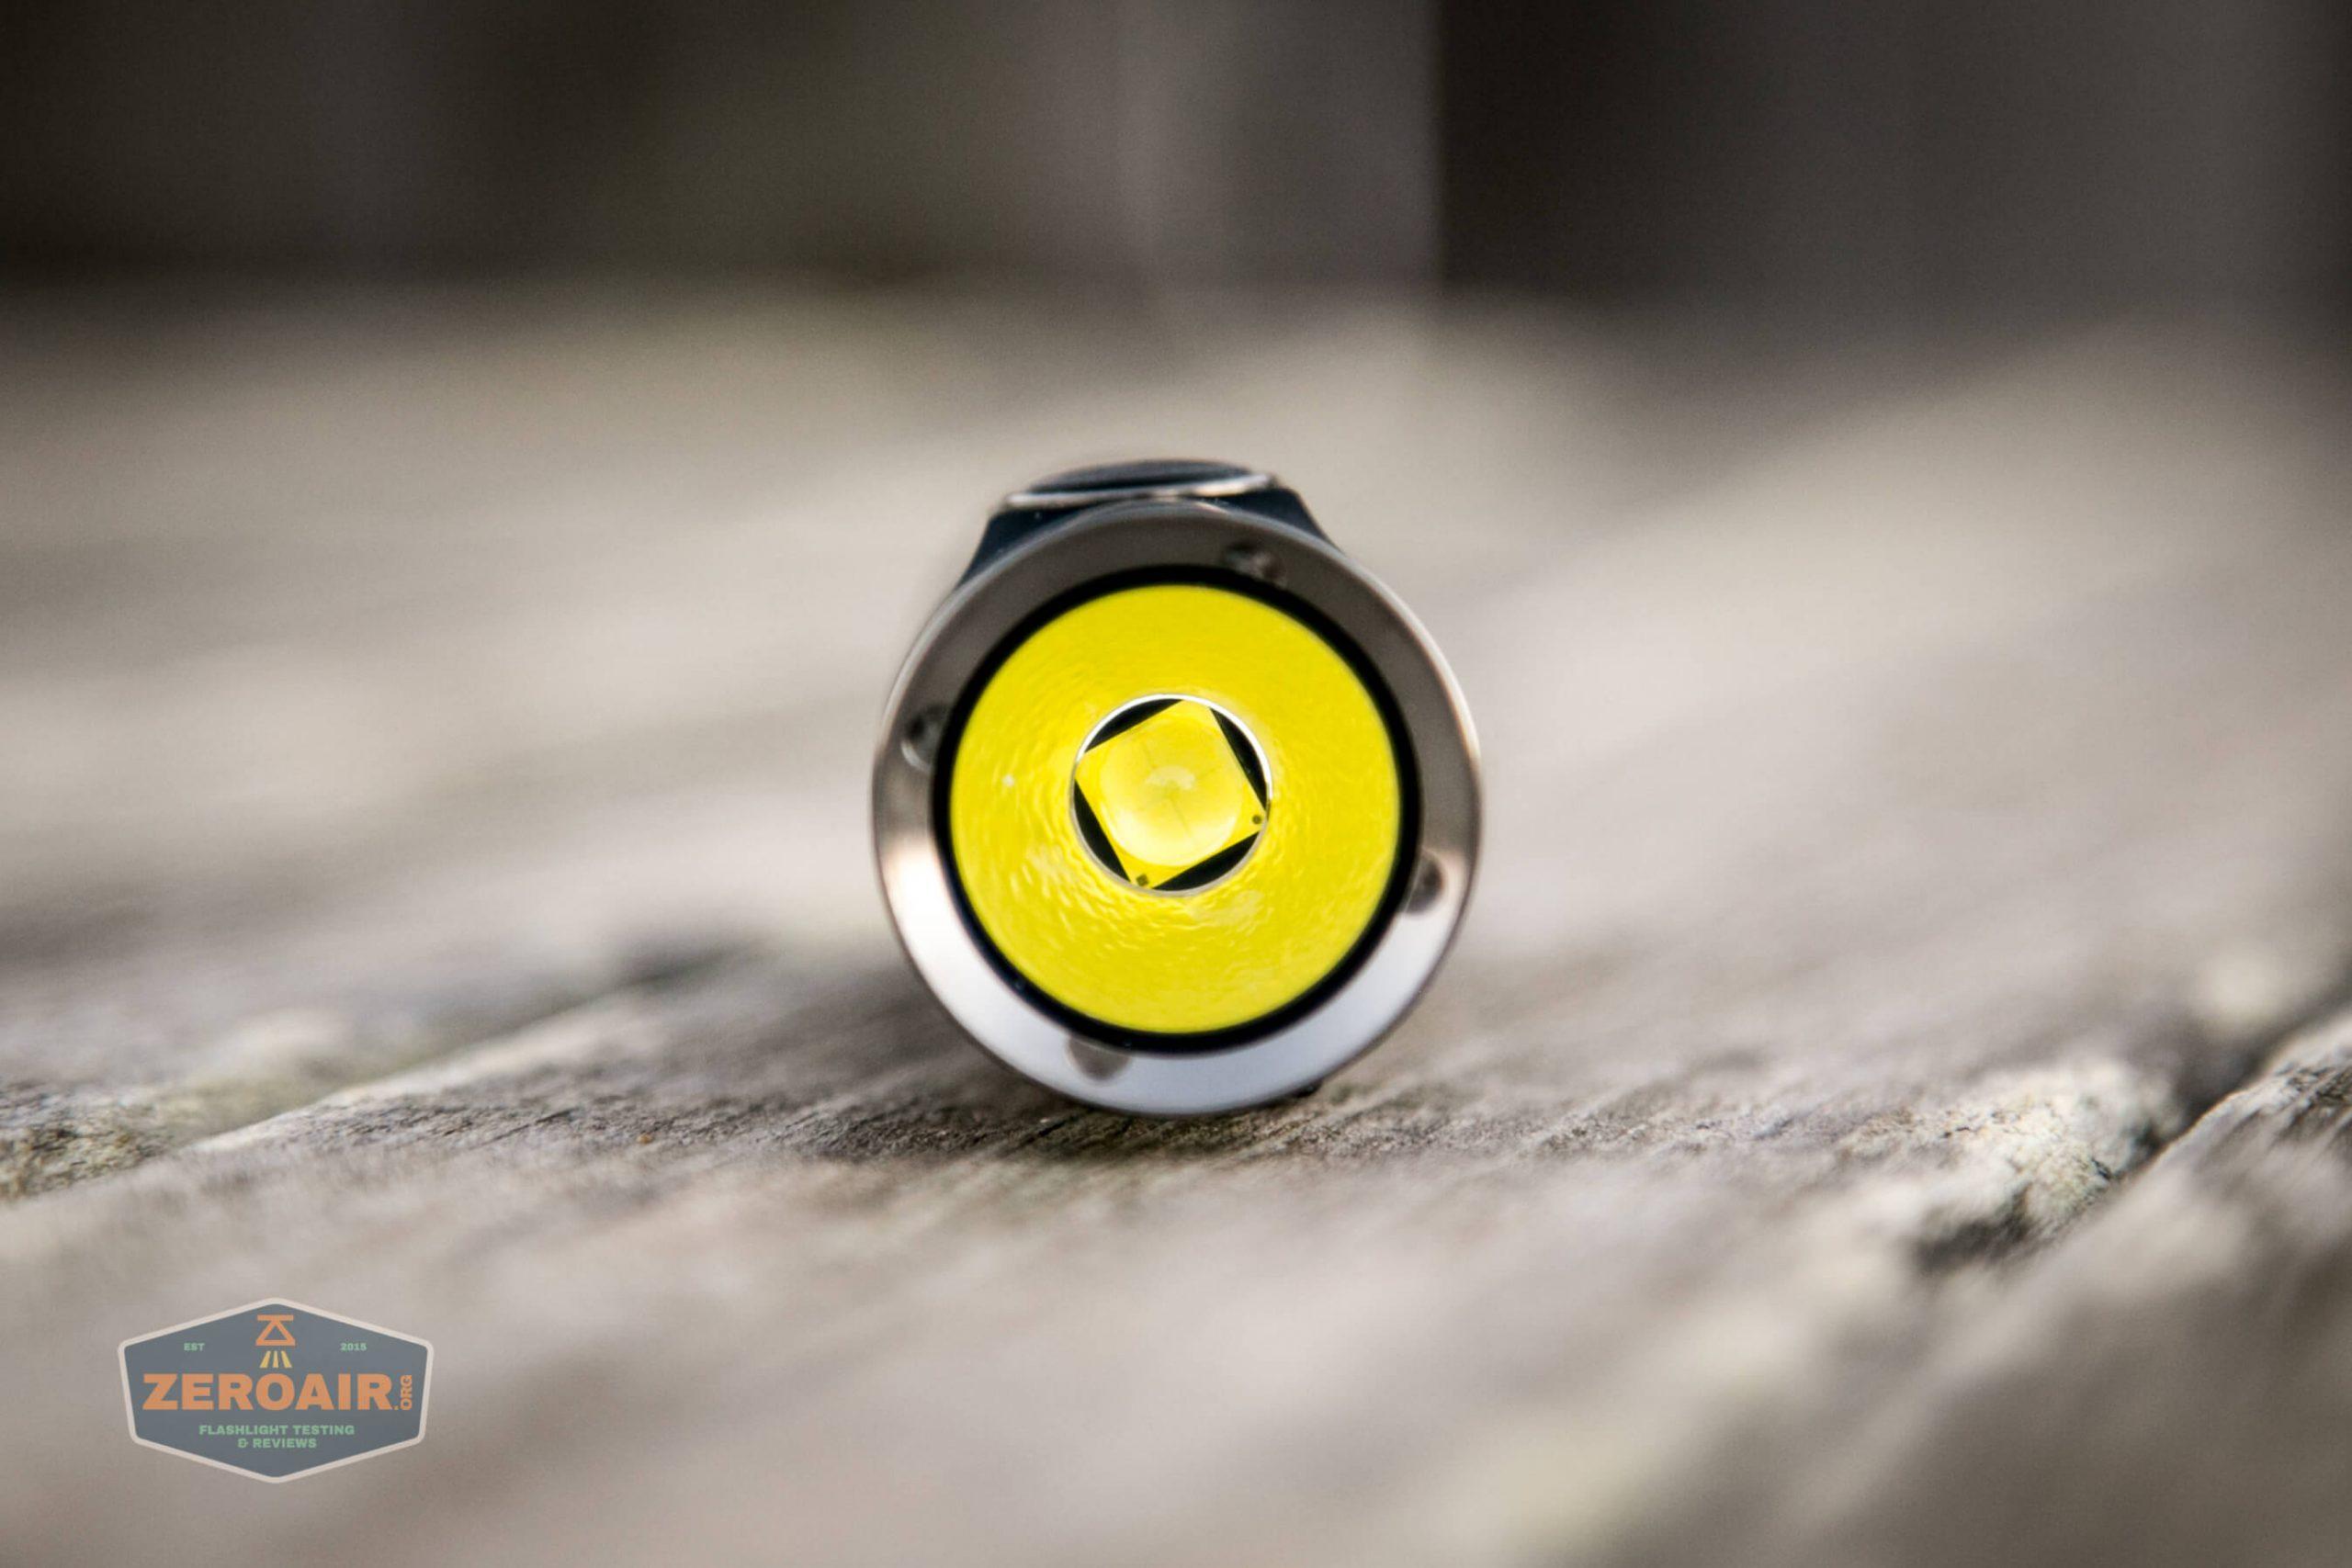 klarus g25 21700 cree xhp70.2 flashlight emitter